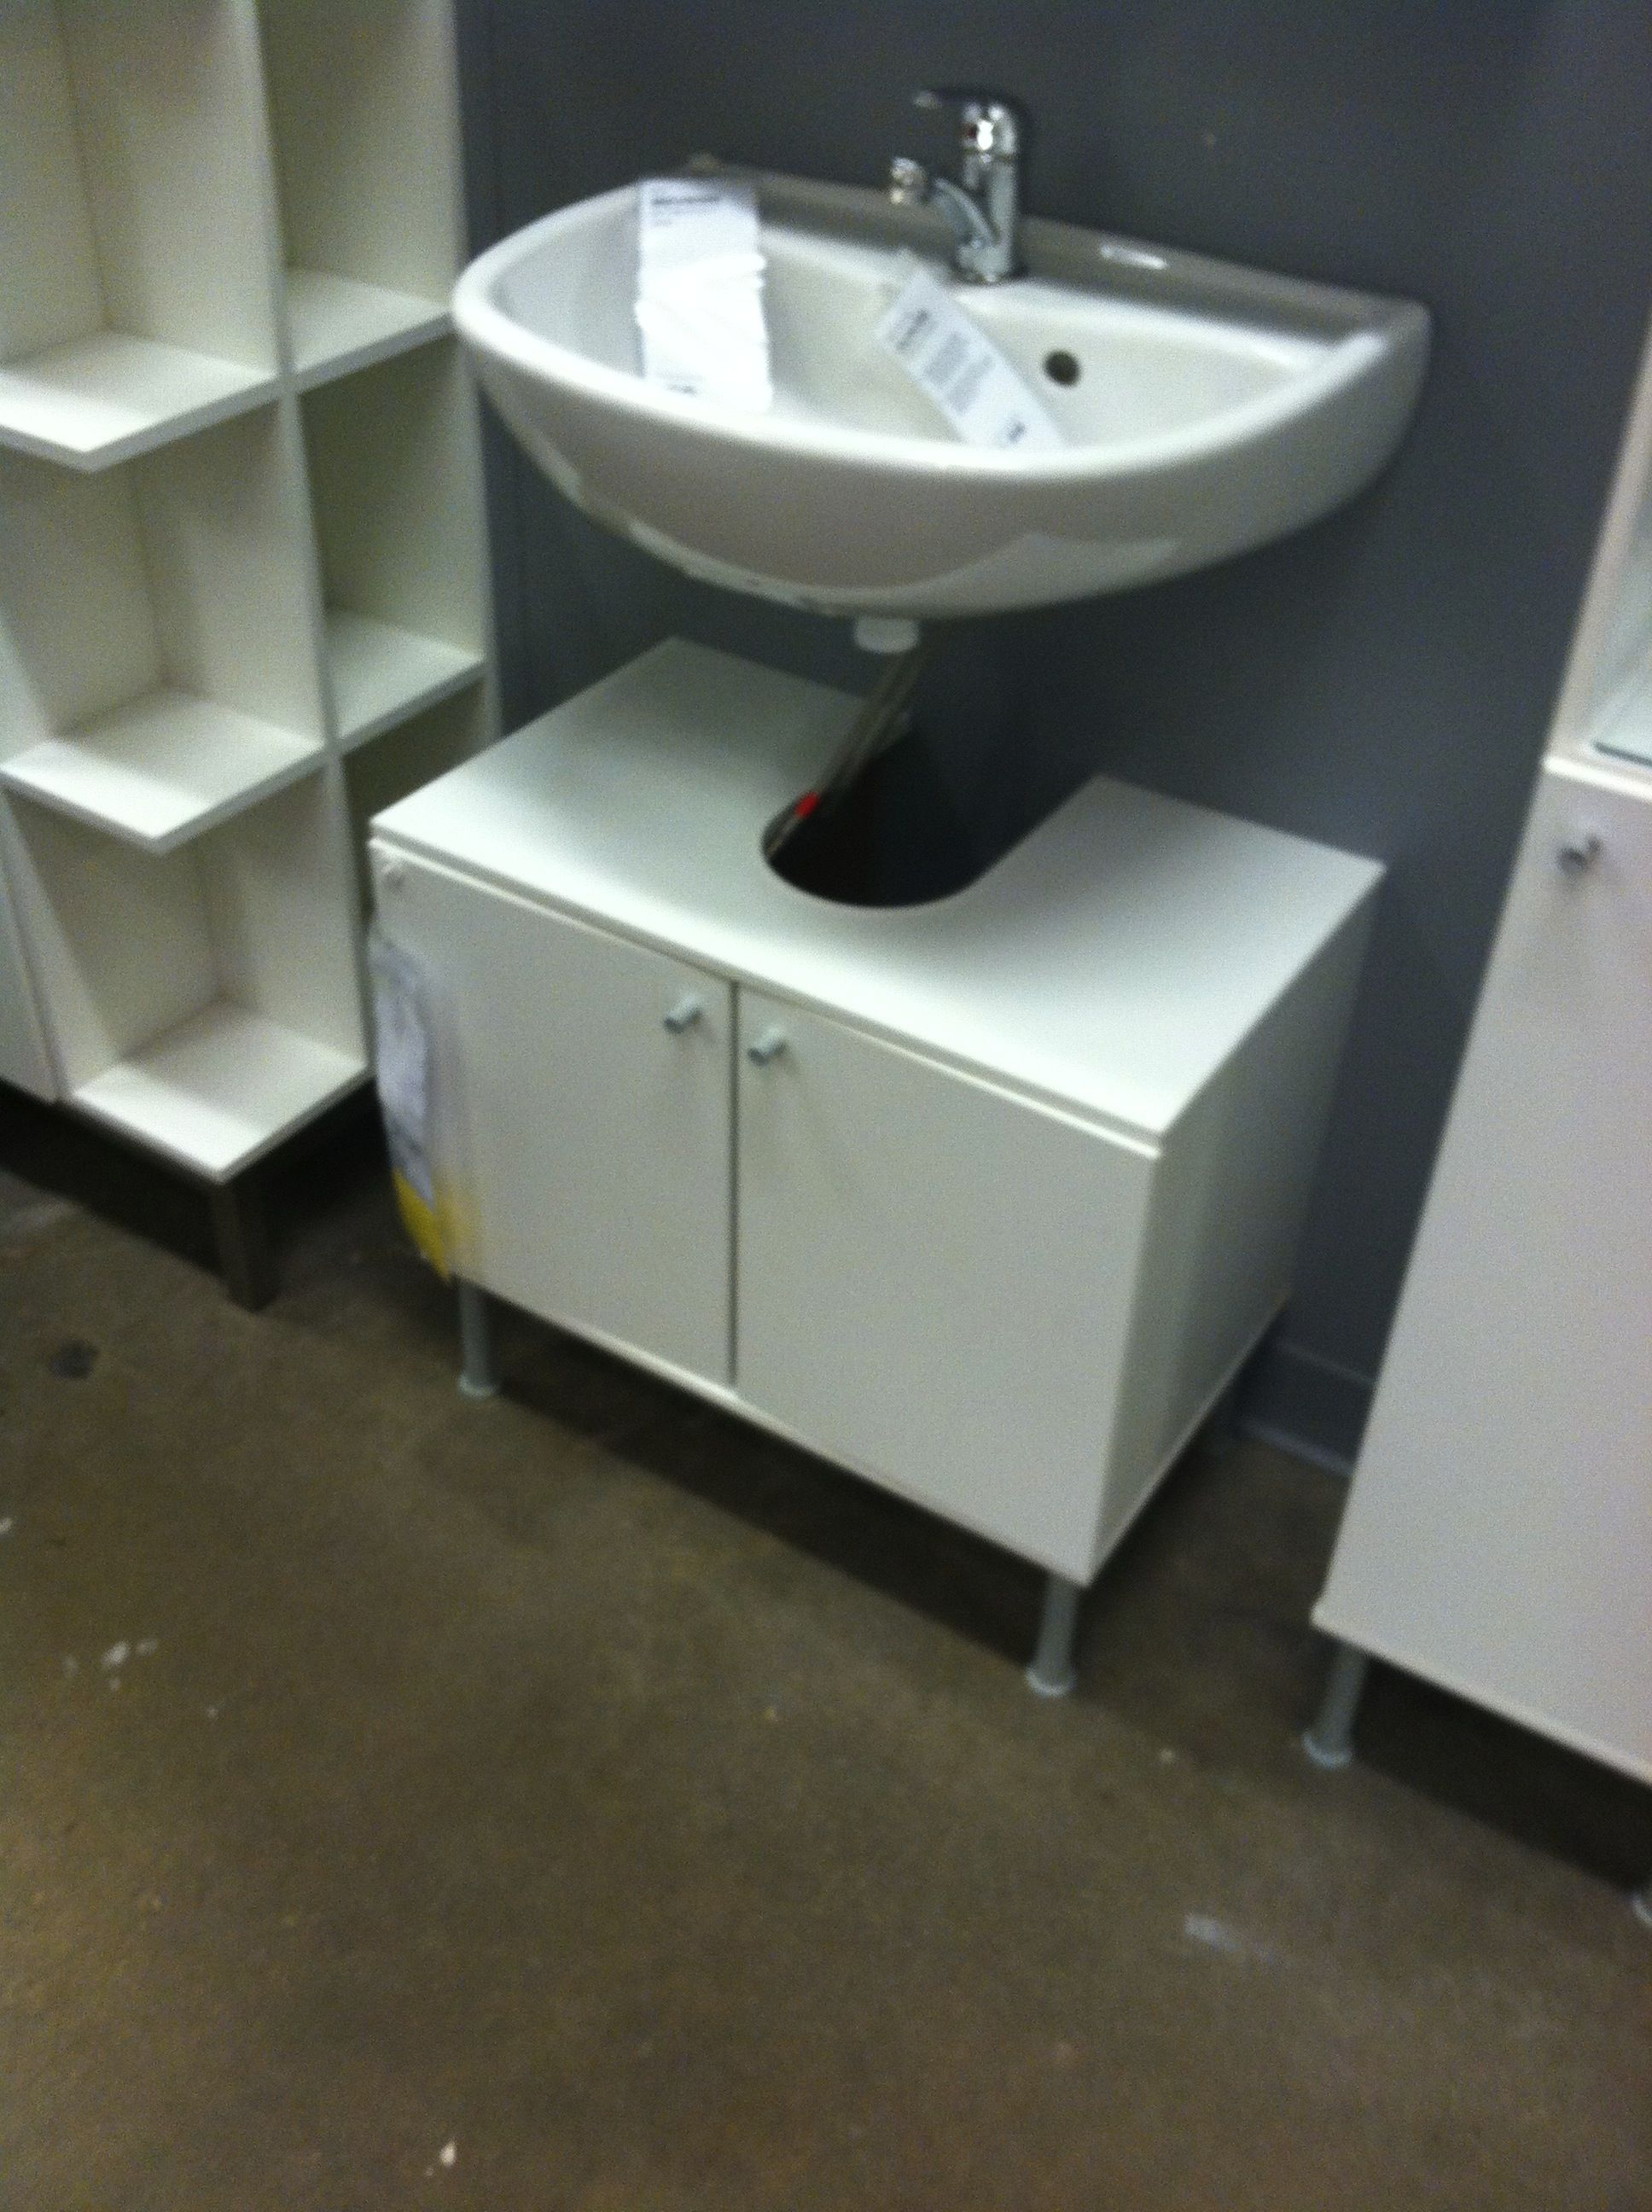 Hide Pipes Under Open Bathroom Sink Ikea Morgantown House